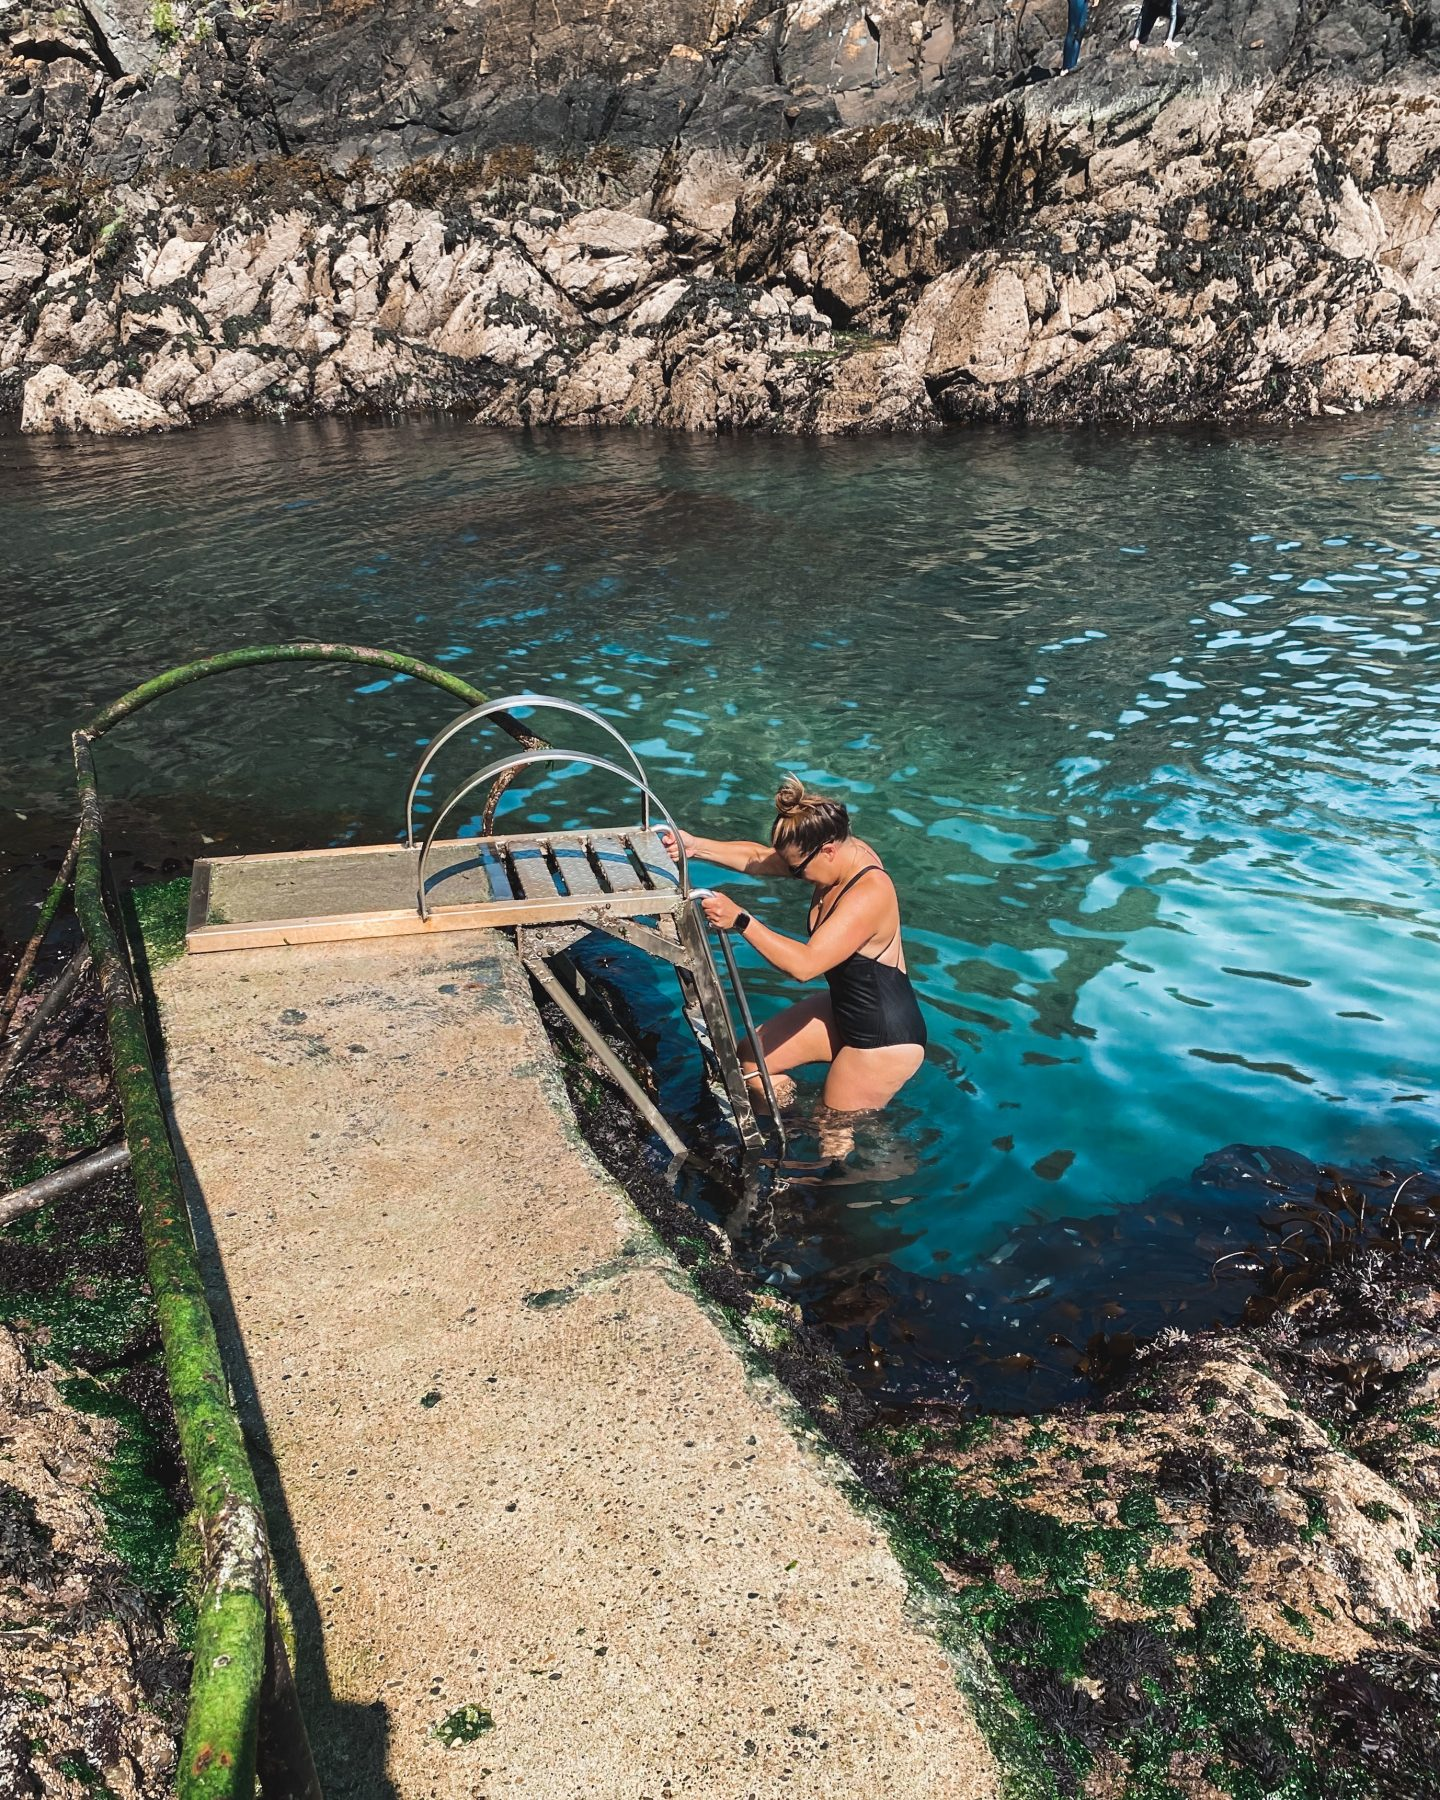 newtown cove guillamene swimming tramore